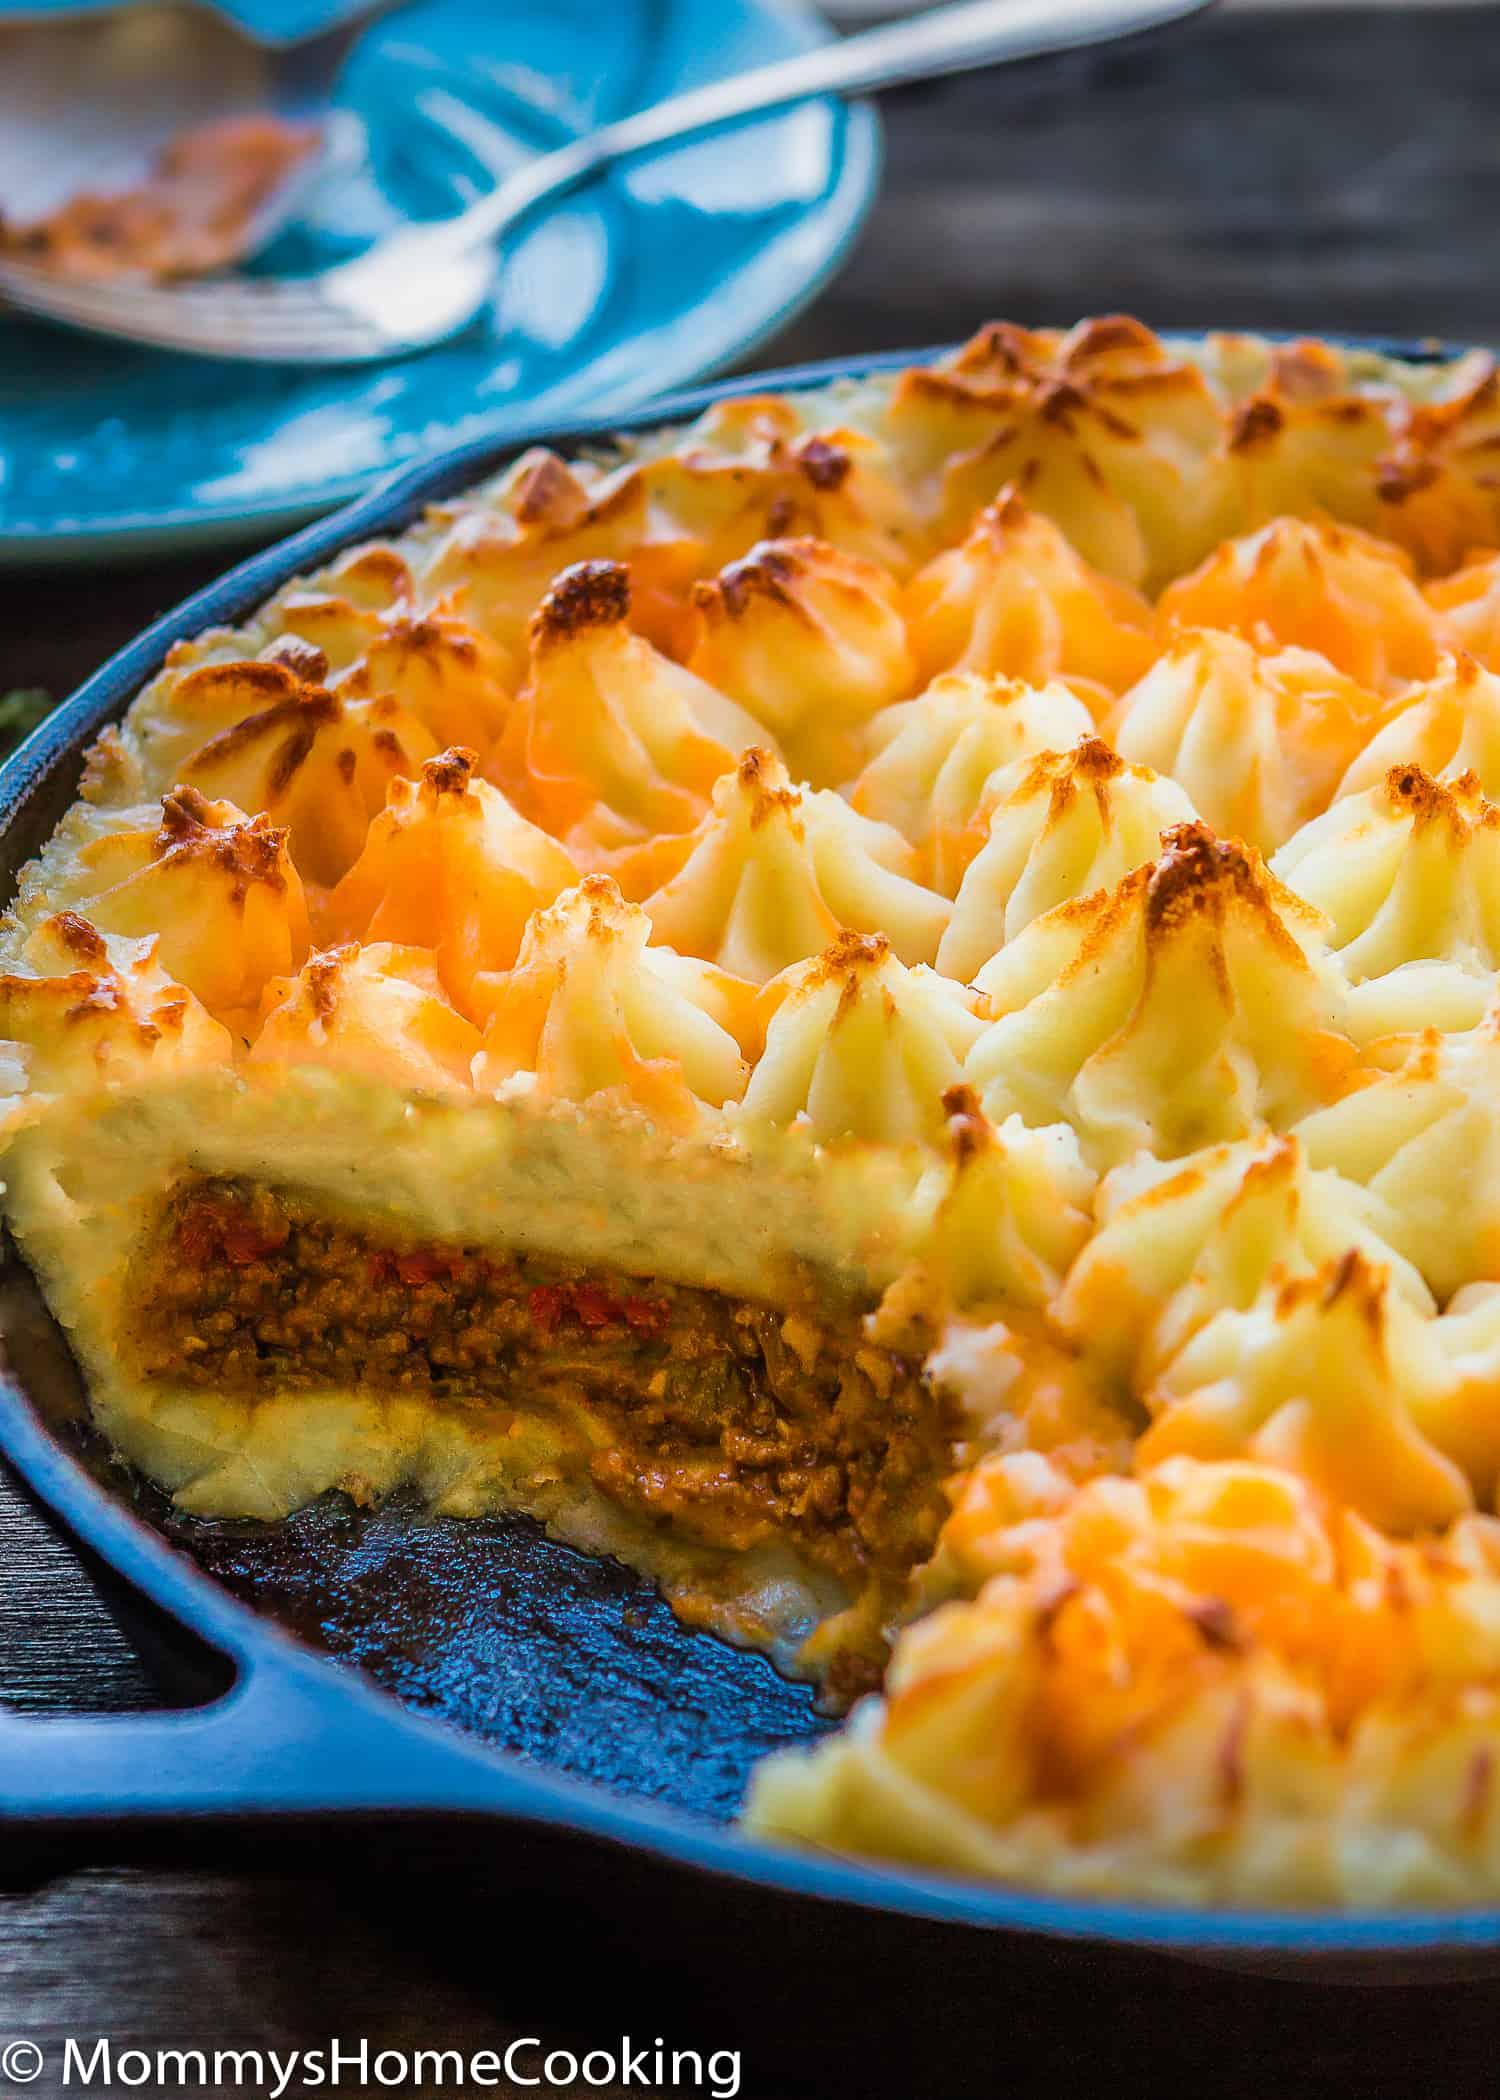 Easy Shepherd's Pie ... my way! - Mommy's Home Cooking  Easy Shepherd&#...